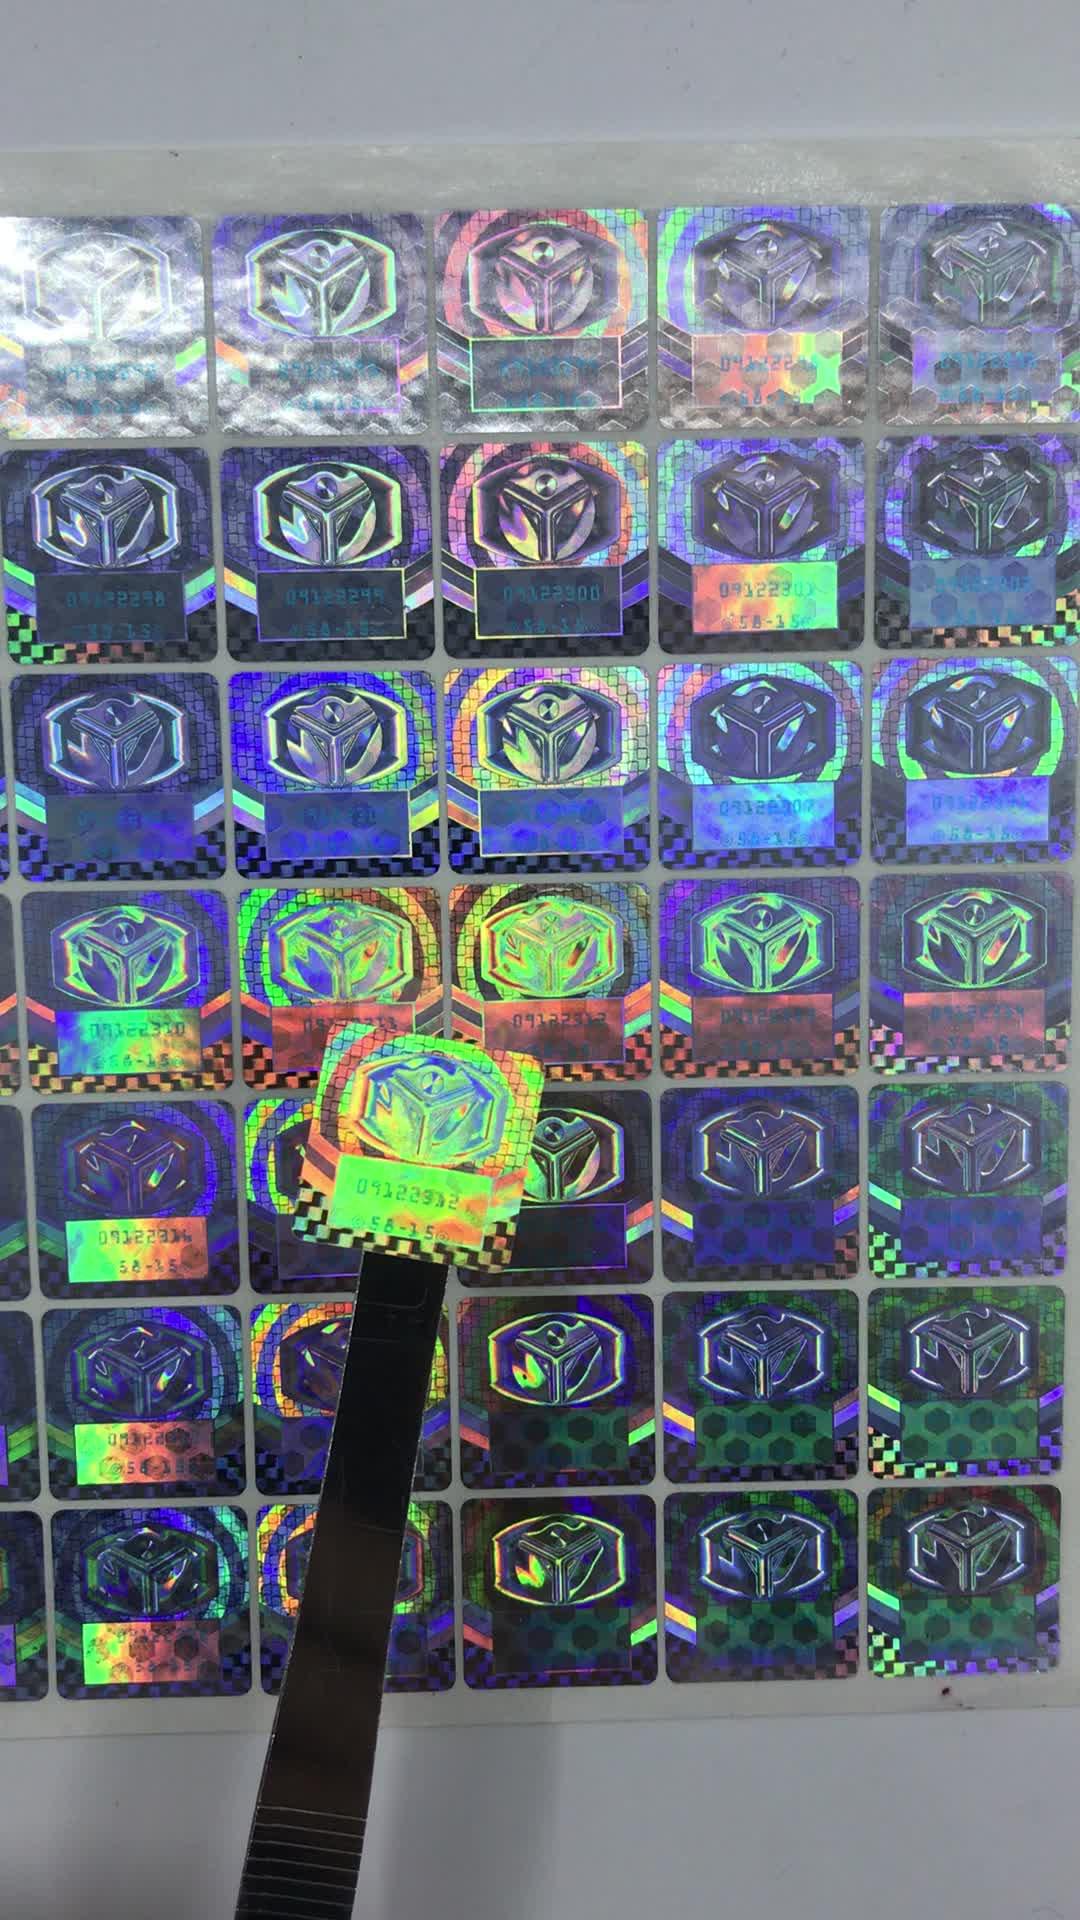 3D hologram security sticker in rolls or in sheets,Nice holographic foil sheets 3d print hologram on paper sheet